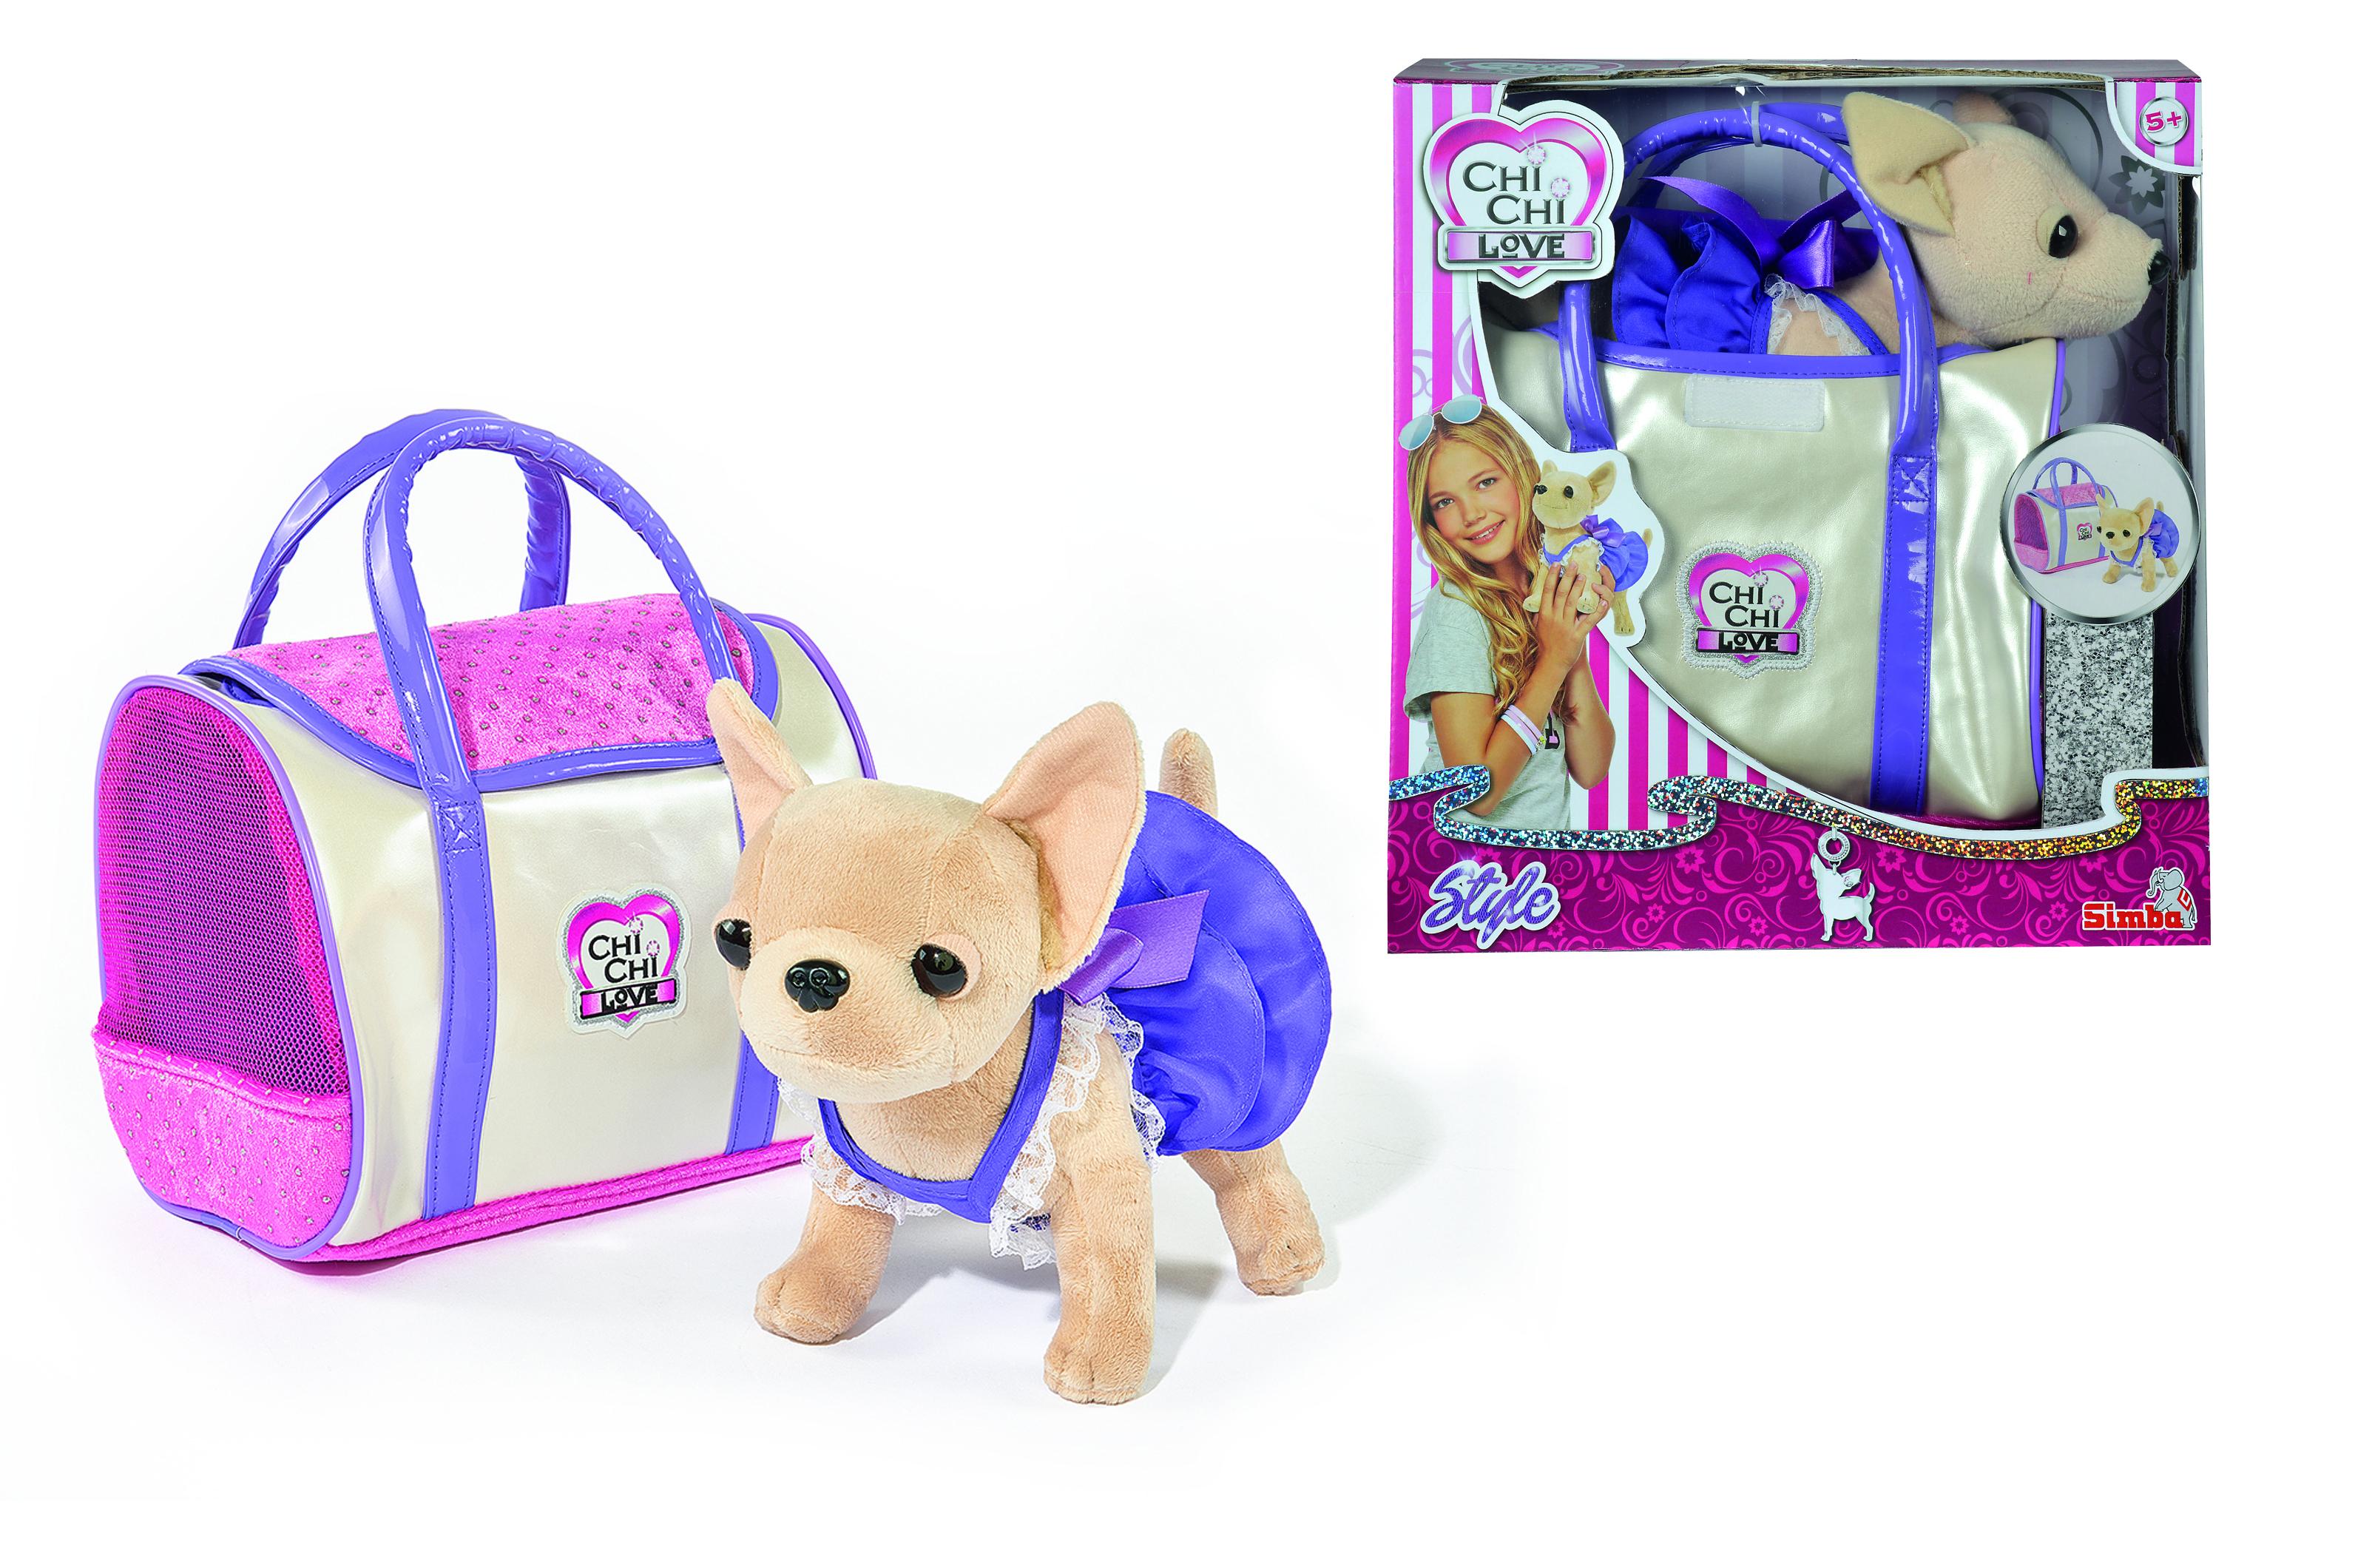 Мягкая игрушка Chi Chi Love Собачка Чихуахуа мягкие игрушки chi chi love плюшевая собачка чихуахуа в балетной пачке с розовой сумочкой 15 см